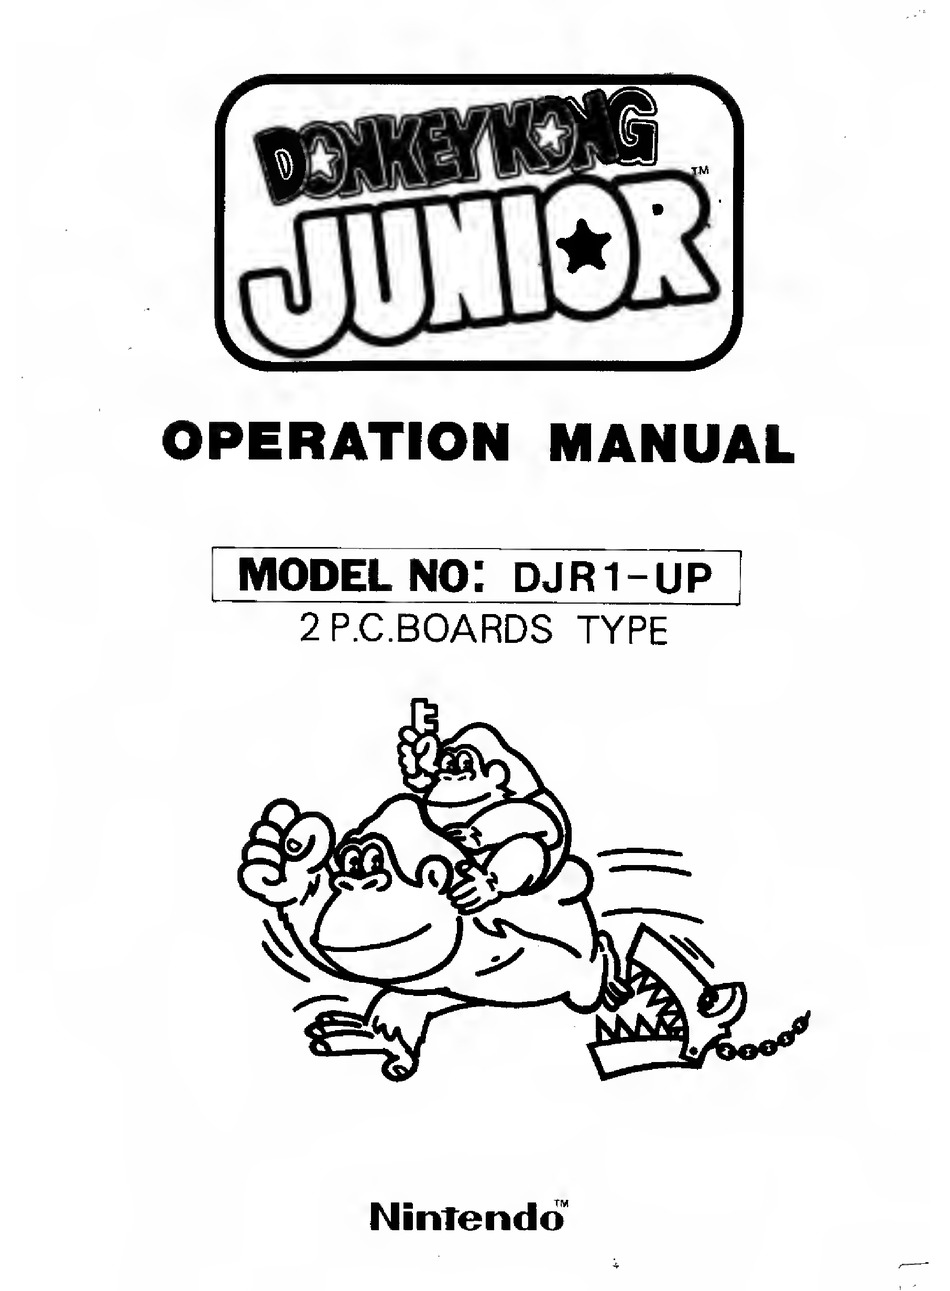 NINTENDO DONKEY KONG JUNIOR DJR1-UP OPERATION MANUAL Pdf